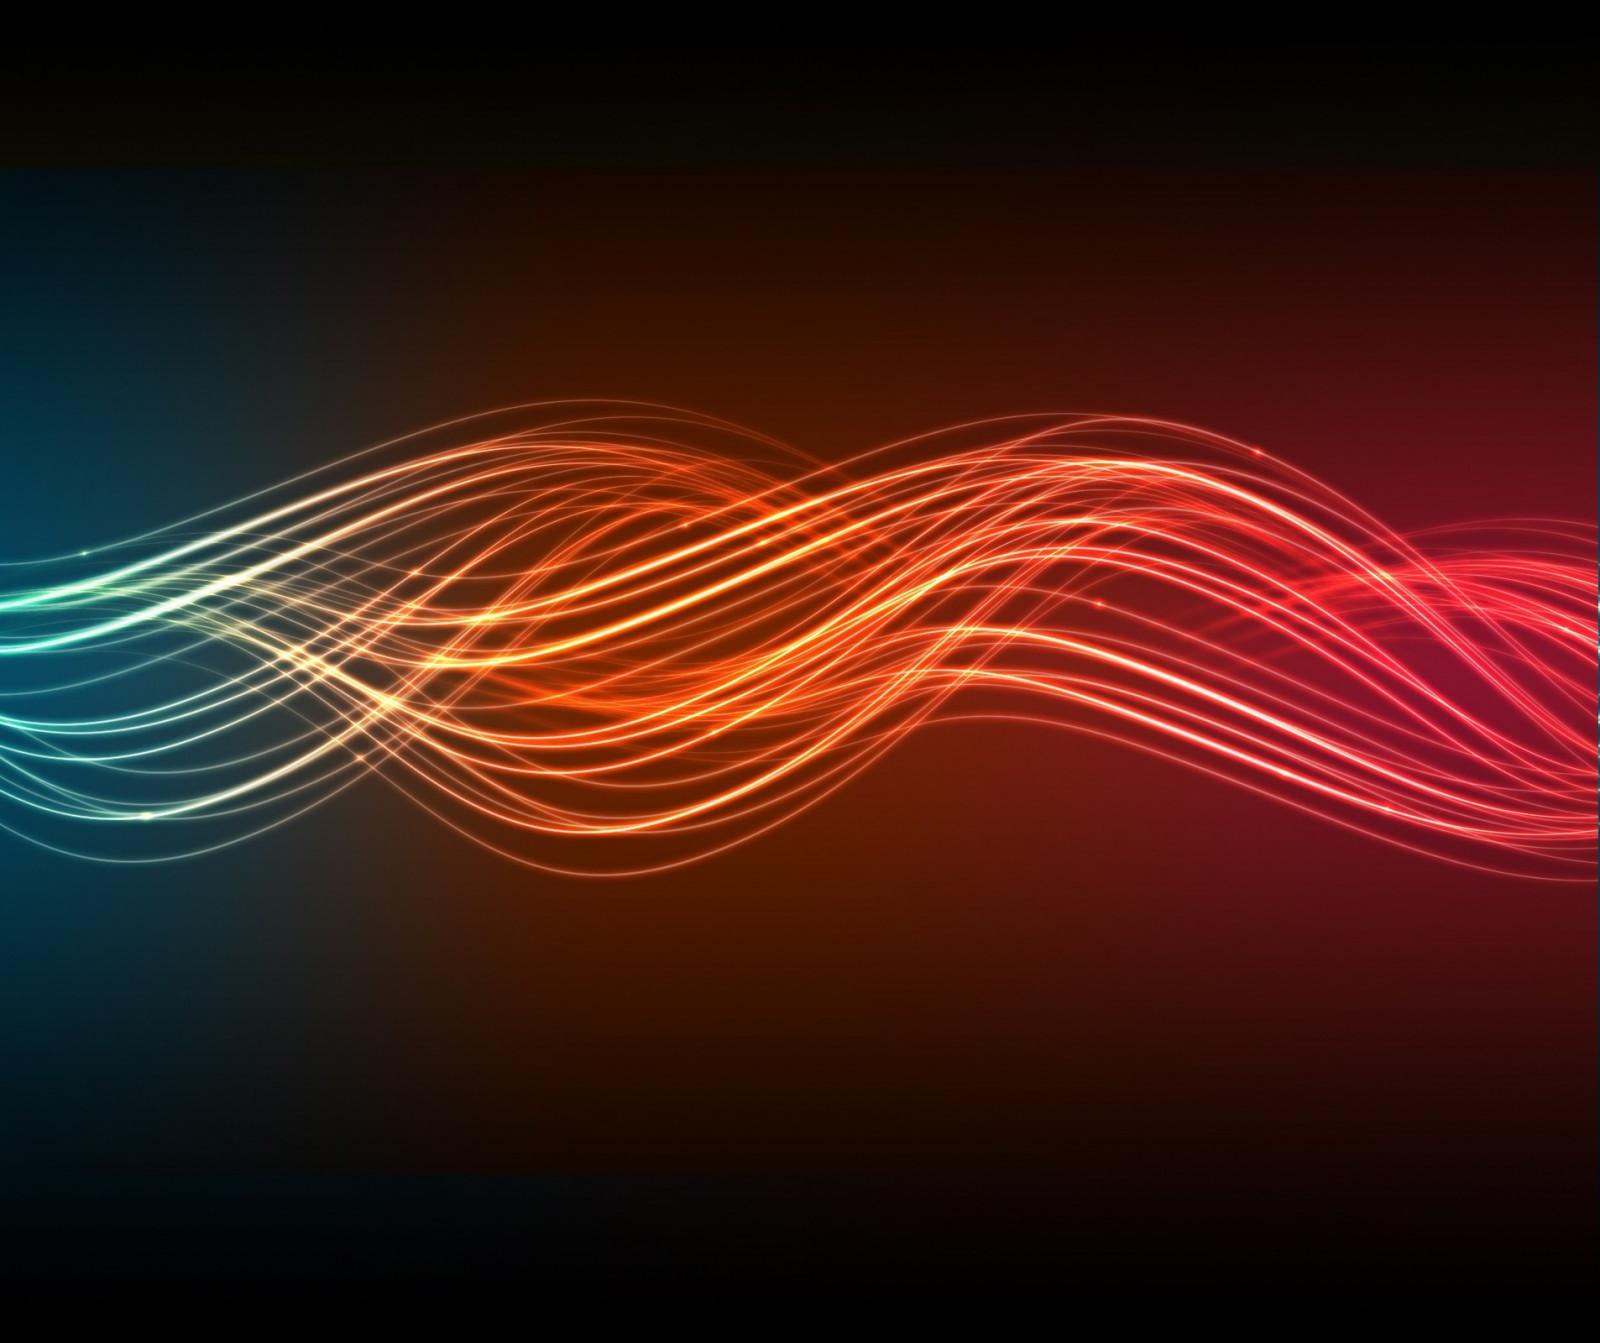 Wallpaper : Abstract, Orange, Spectrum, Light, Line